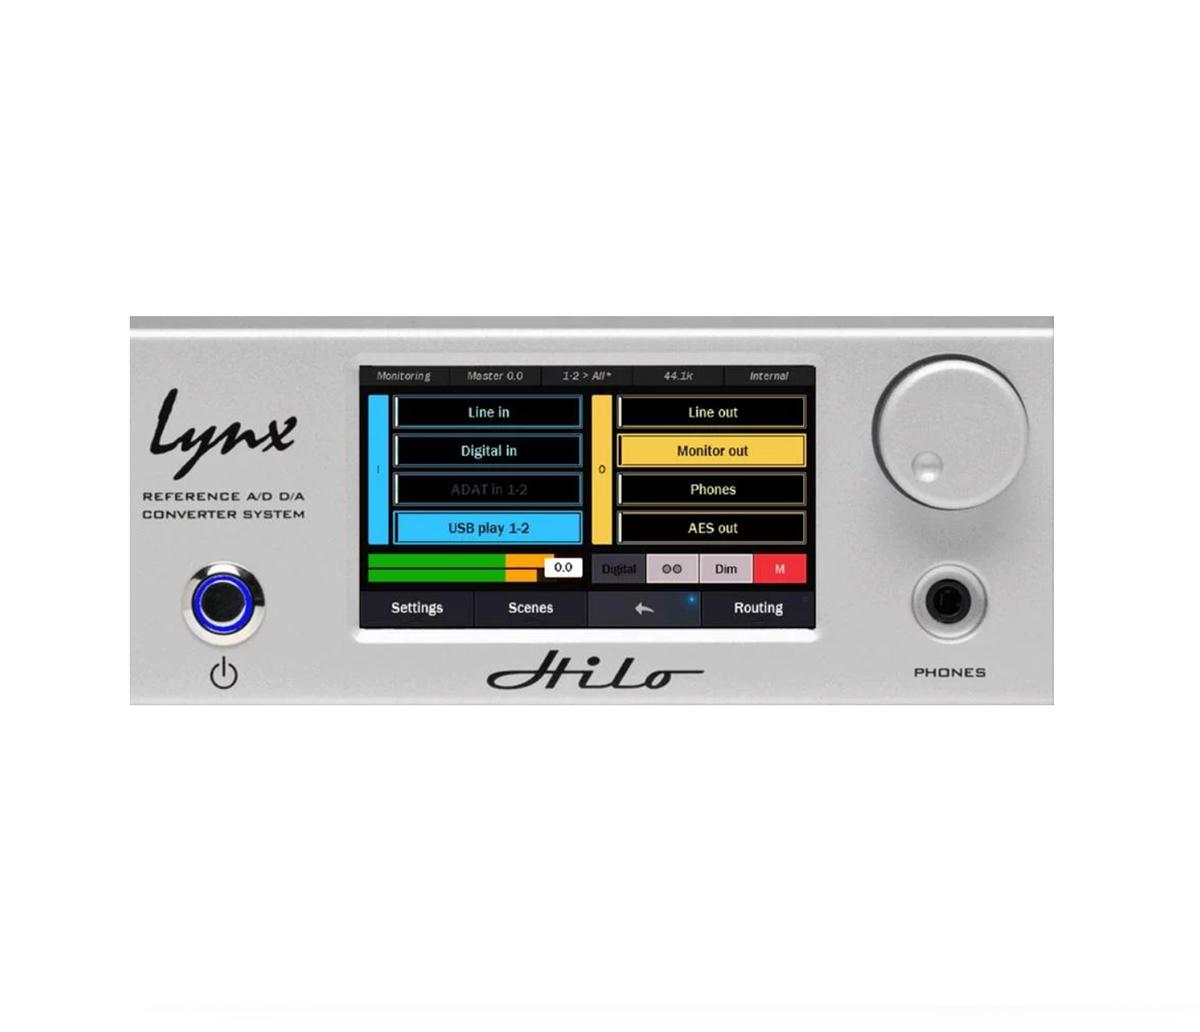 CONVERSOR AD/DA LYNX STUDIO TECHNOLOGY HILO REFERENCE THUNDERBOLT SILVER